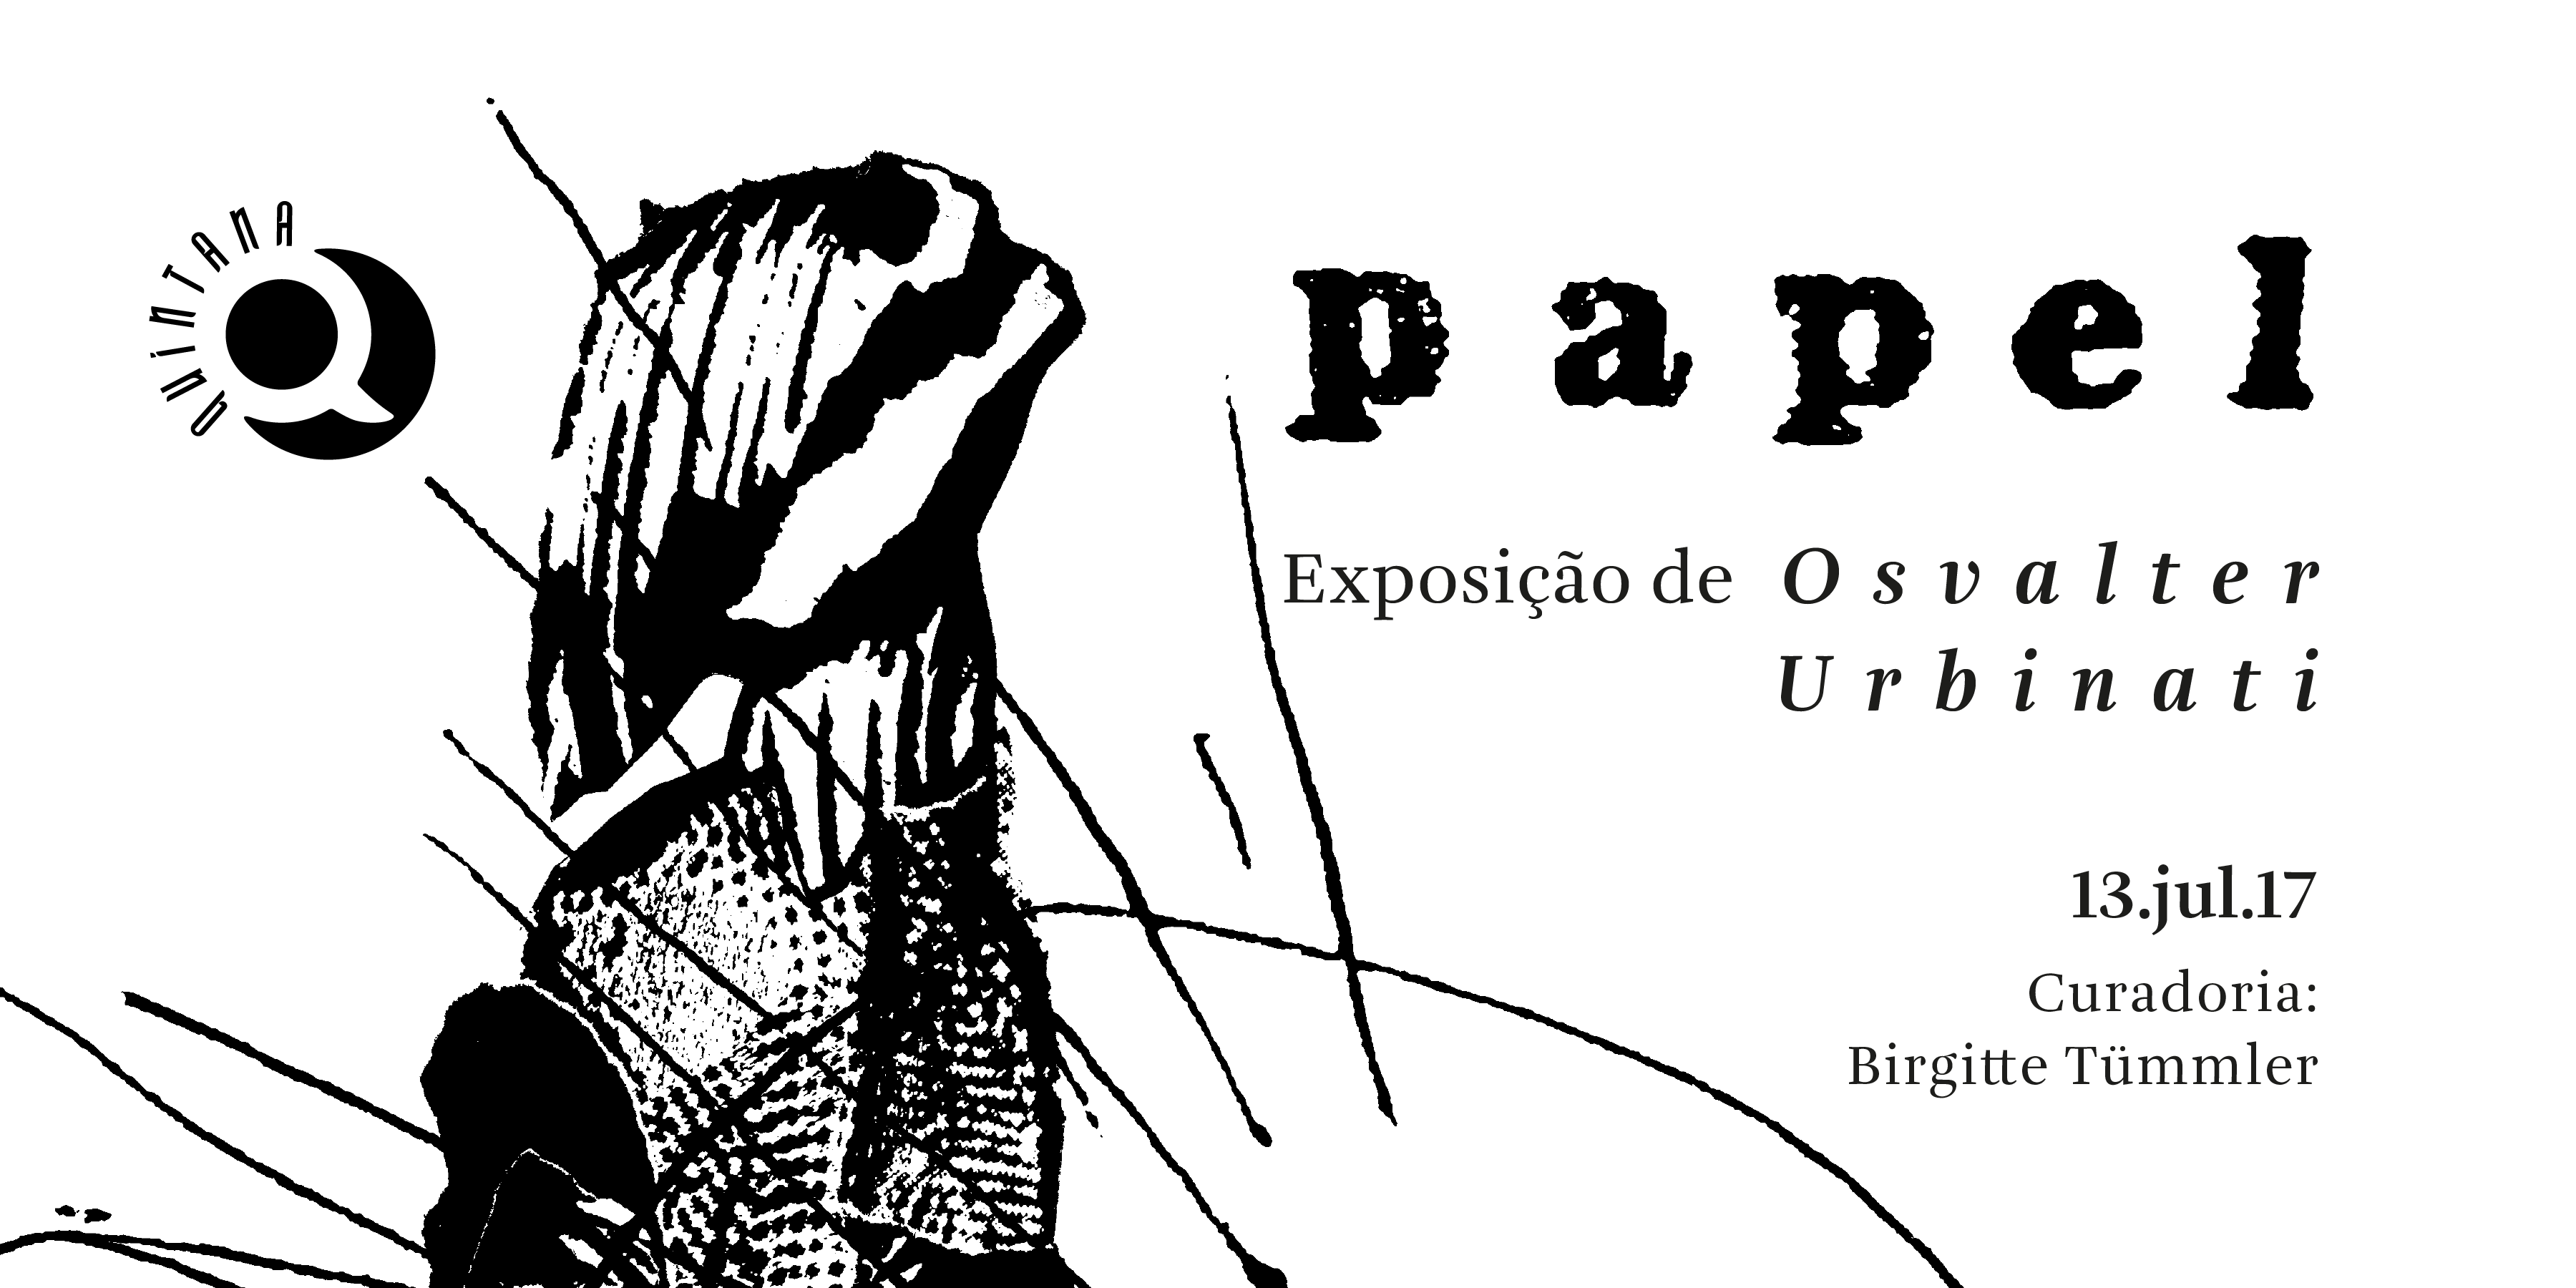 """Papel"", por Osvalter, abre nesta quinta-feira no Quintana"